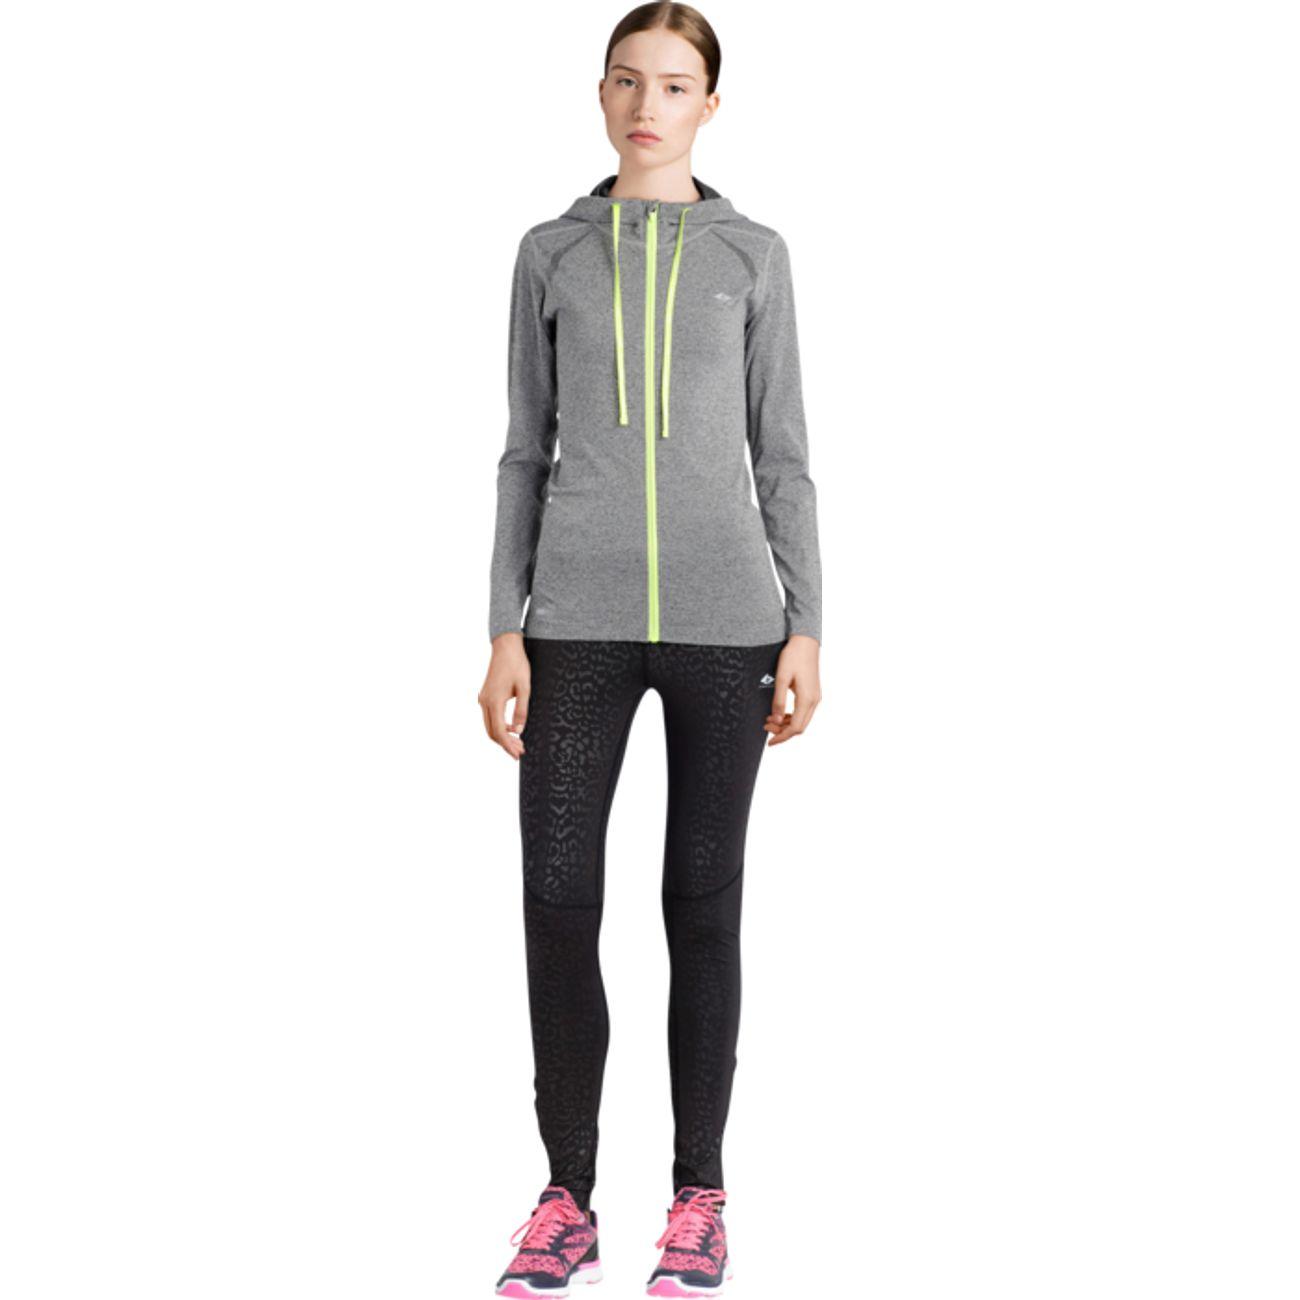 Femme Running Seamless Jacket Jkt Athlitech 300 Gaelle Y6ymbfgI7v